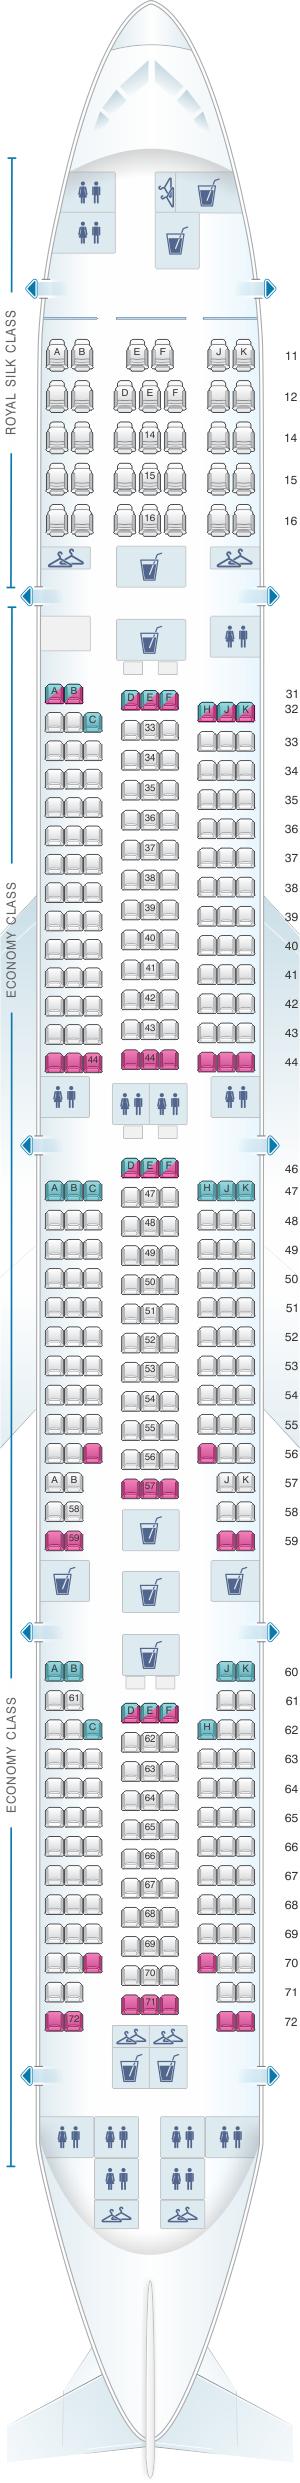 Seat map for Thai Airways International Boeing B777 300 (773)